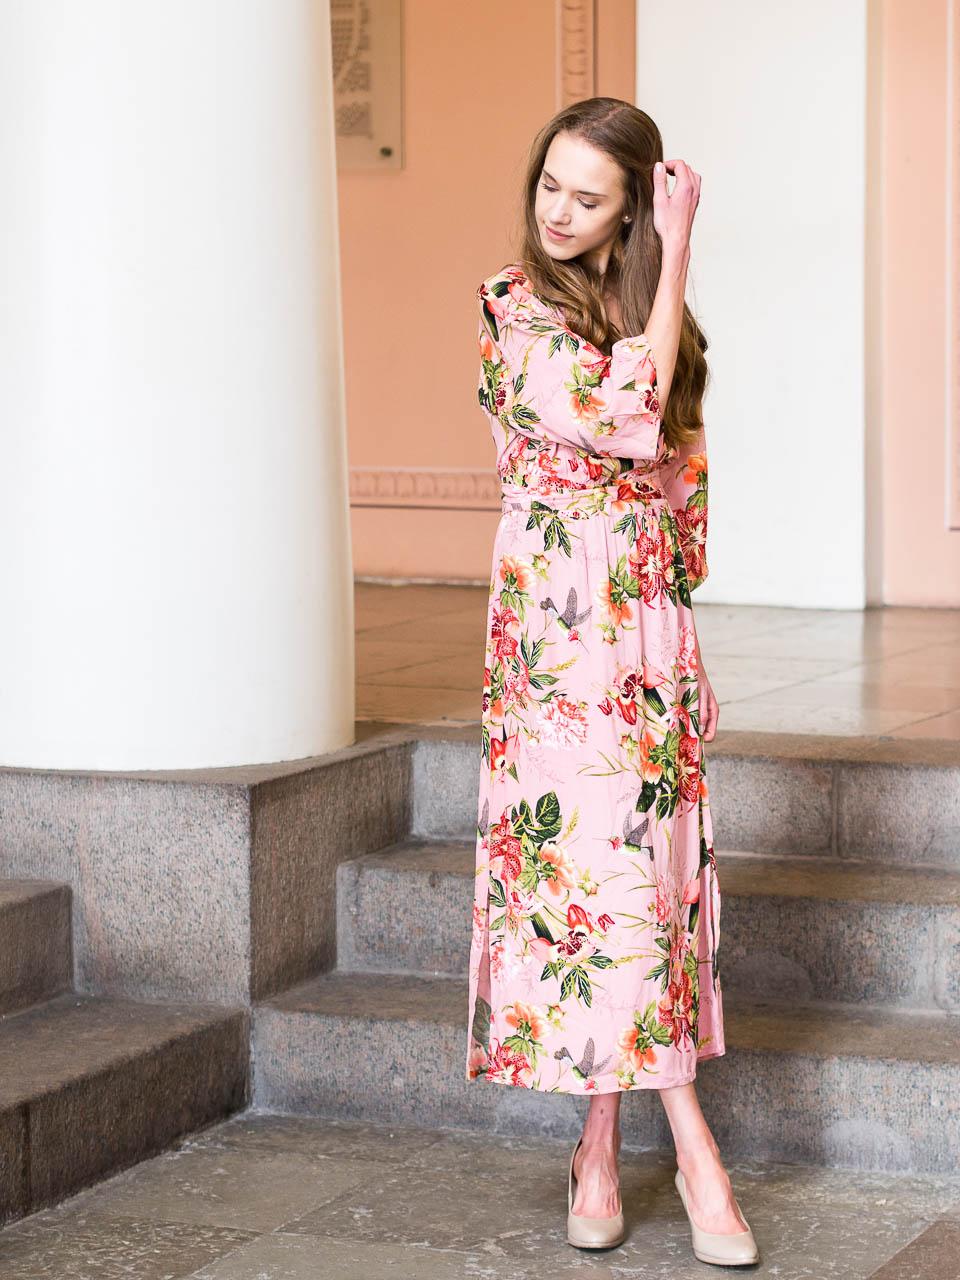 summer-dress-floral-maxi-kappahl-vintage-stories